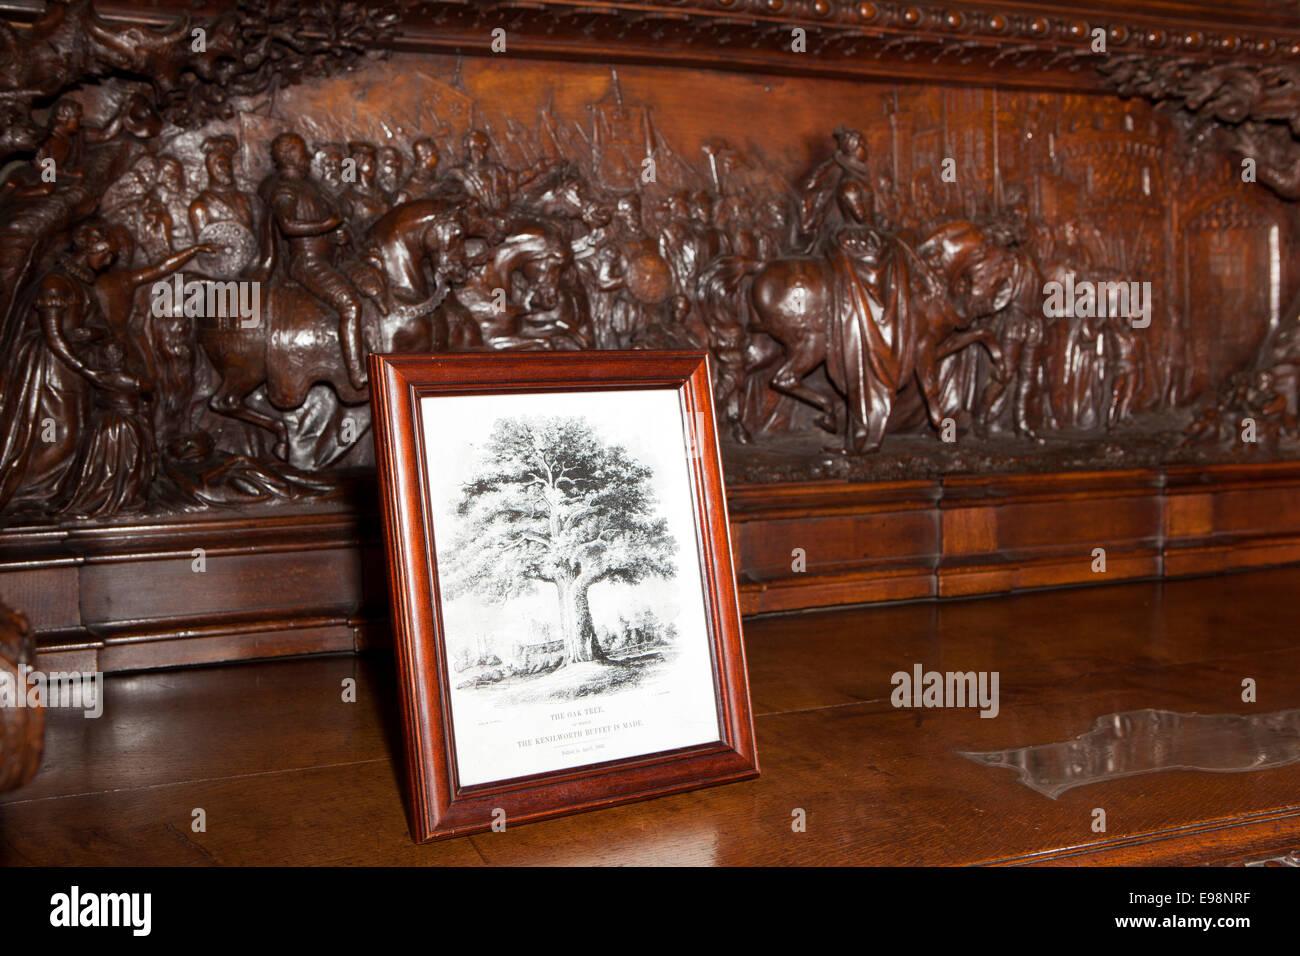 UK, England, Warwickshire, Warwick Castle, the Kenilworth Buffet made from a single oak tree - Stock Image